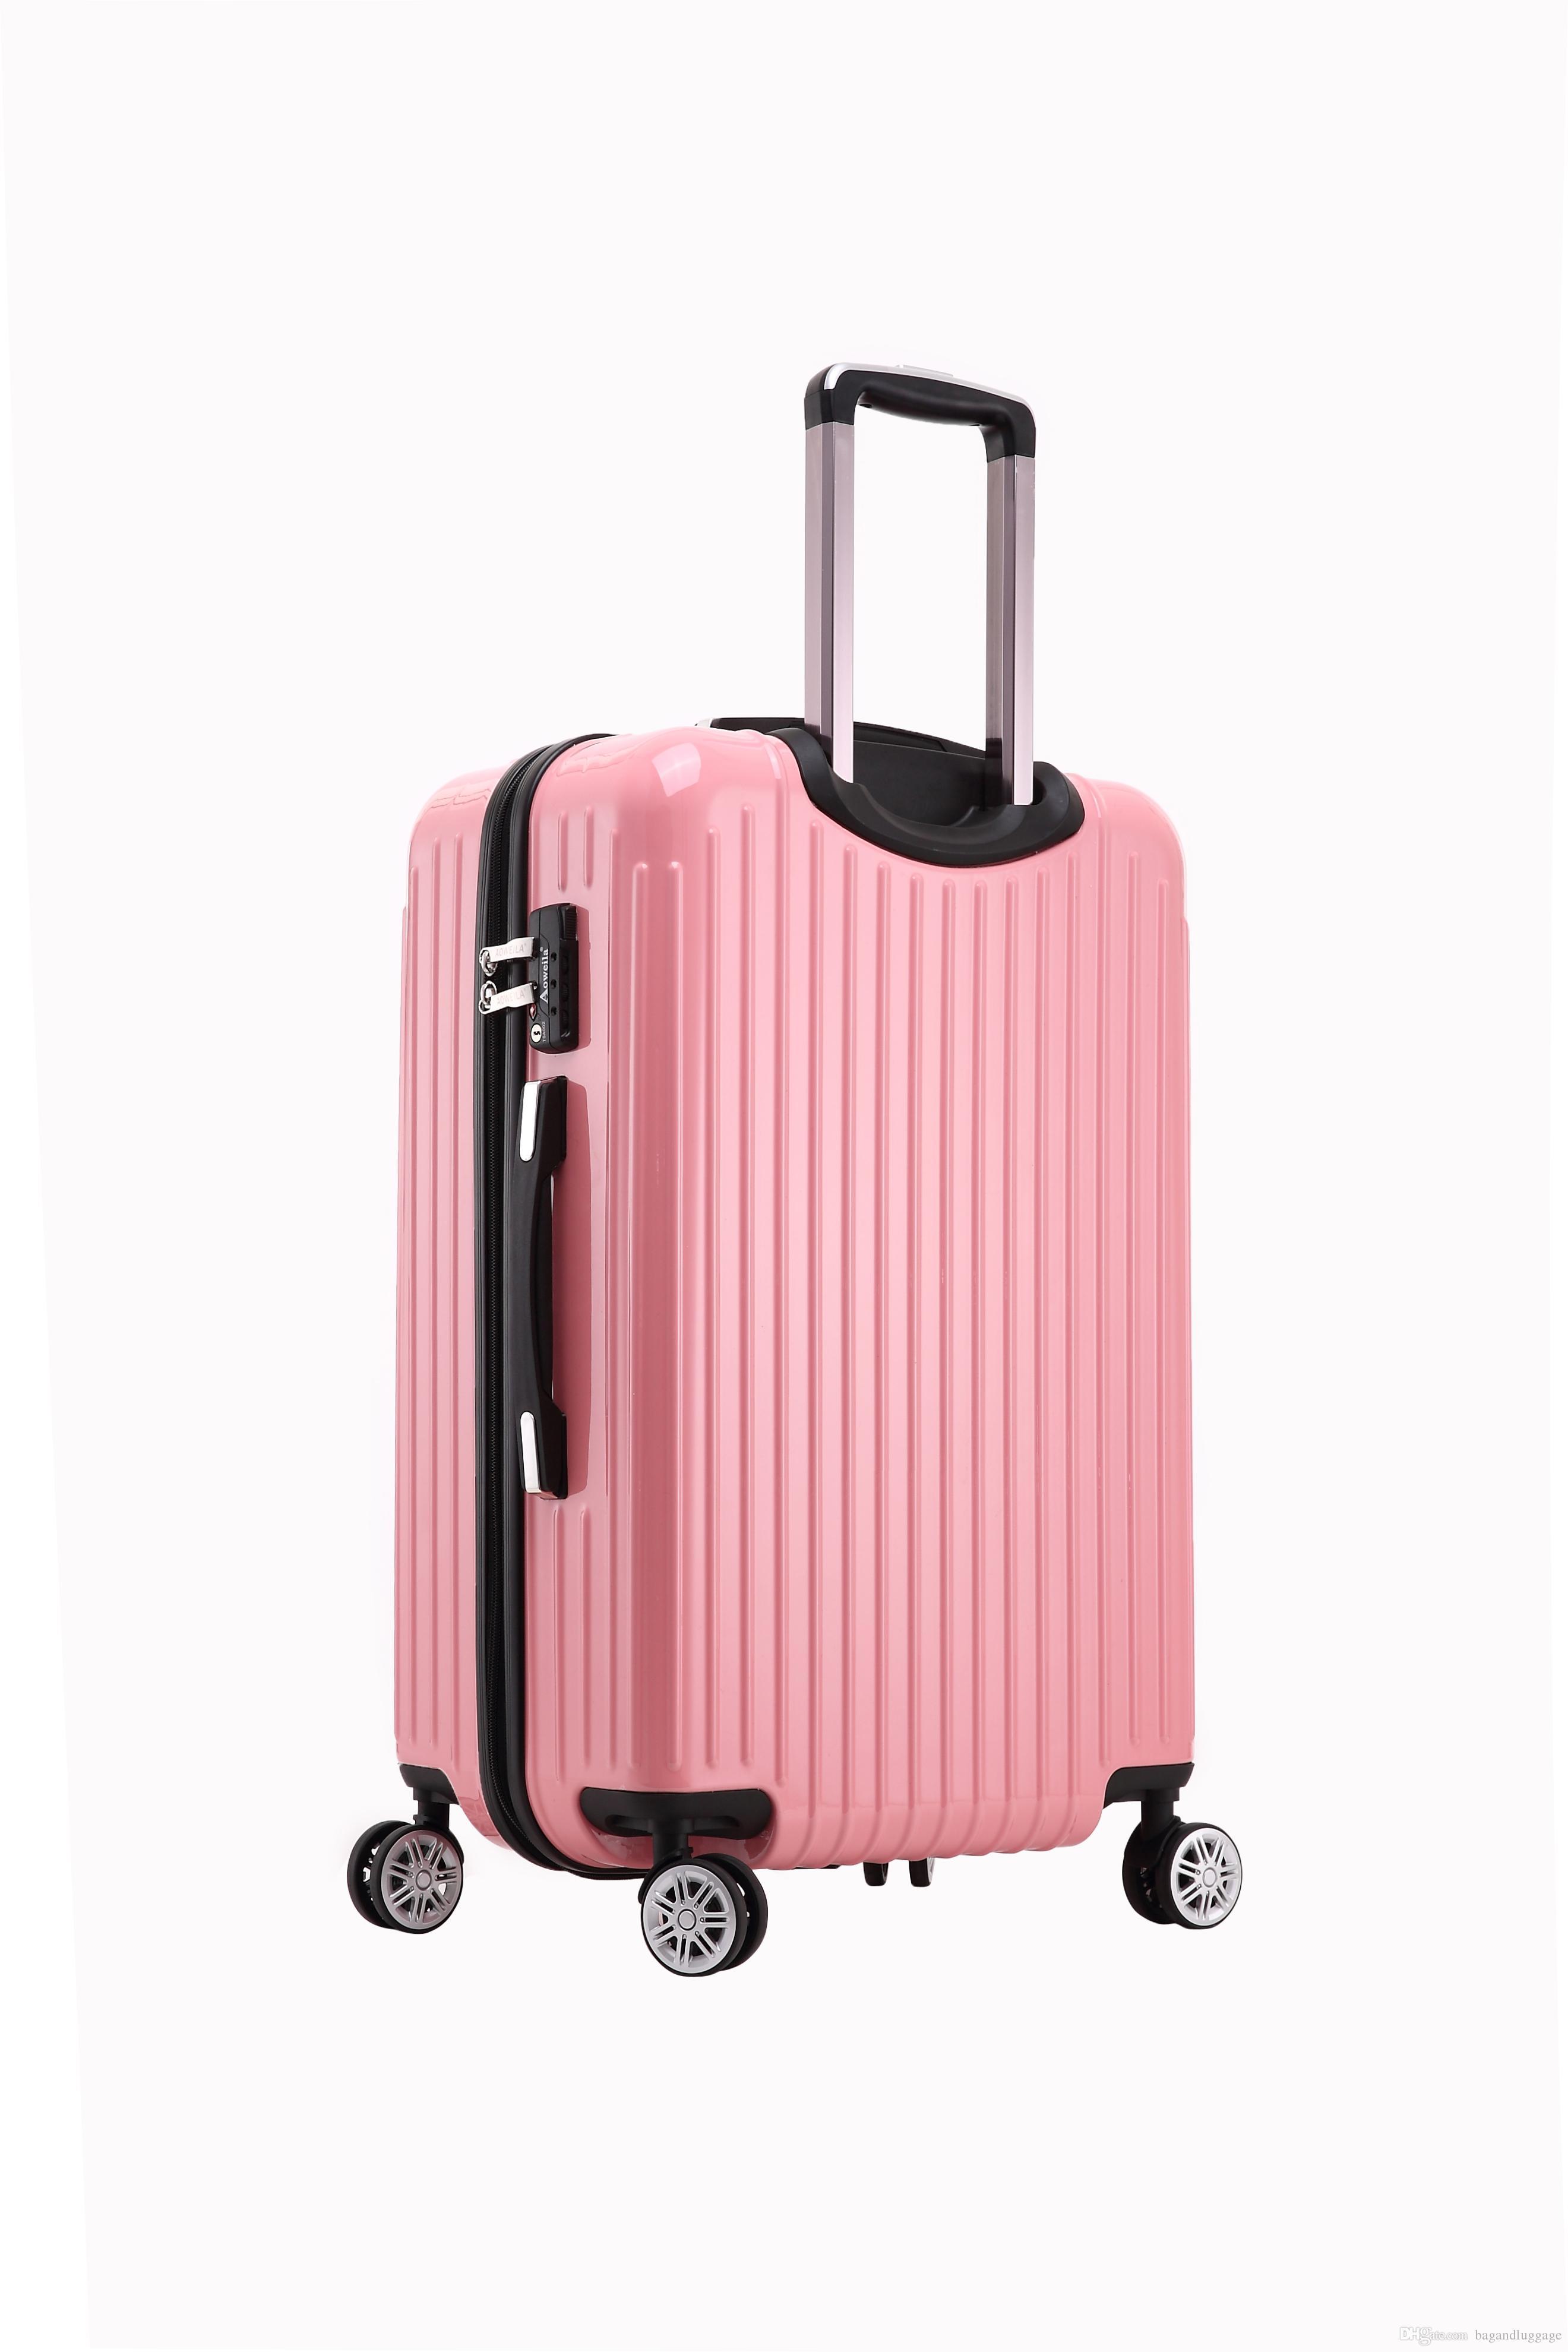 Best Sale Universal Wheel New Air Trolley Luggage Bag Abs Printed ...